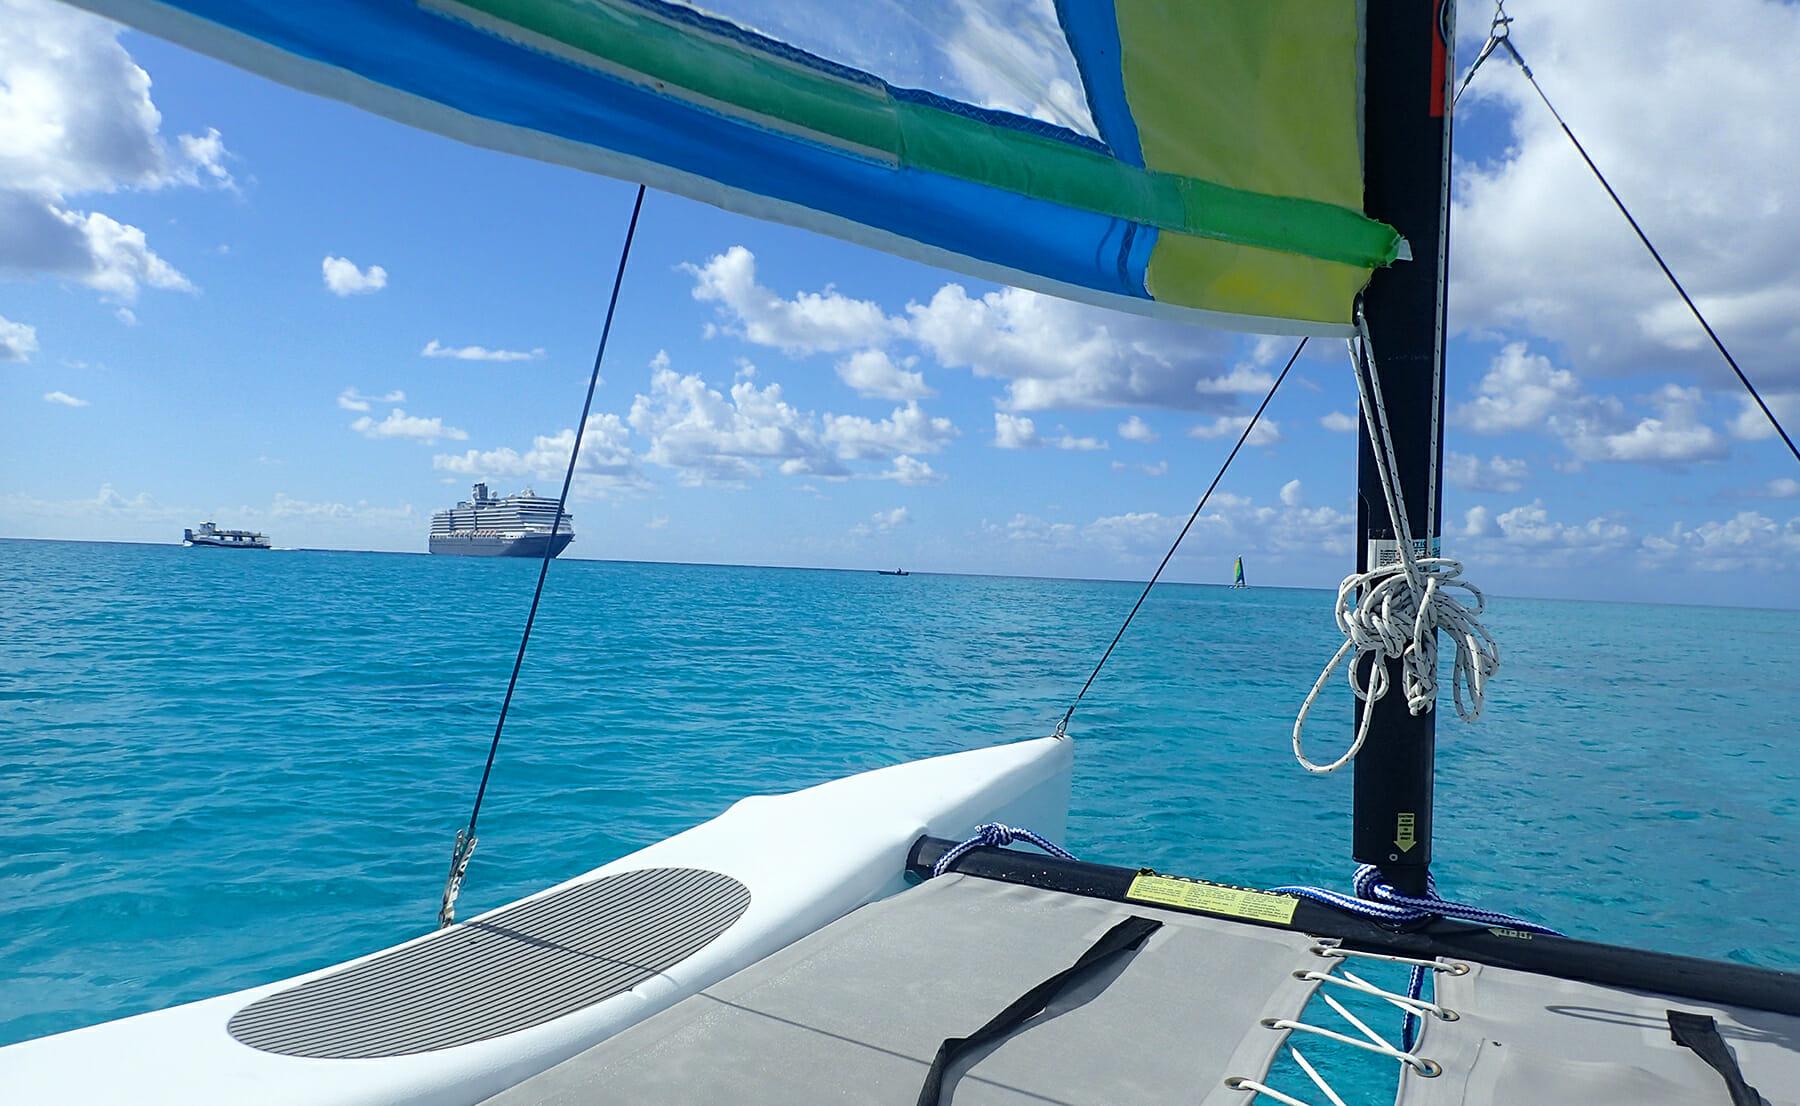 Island Triathlon on Half Moon Cay